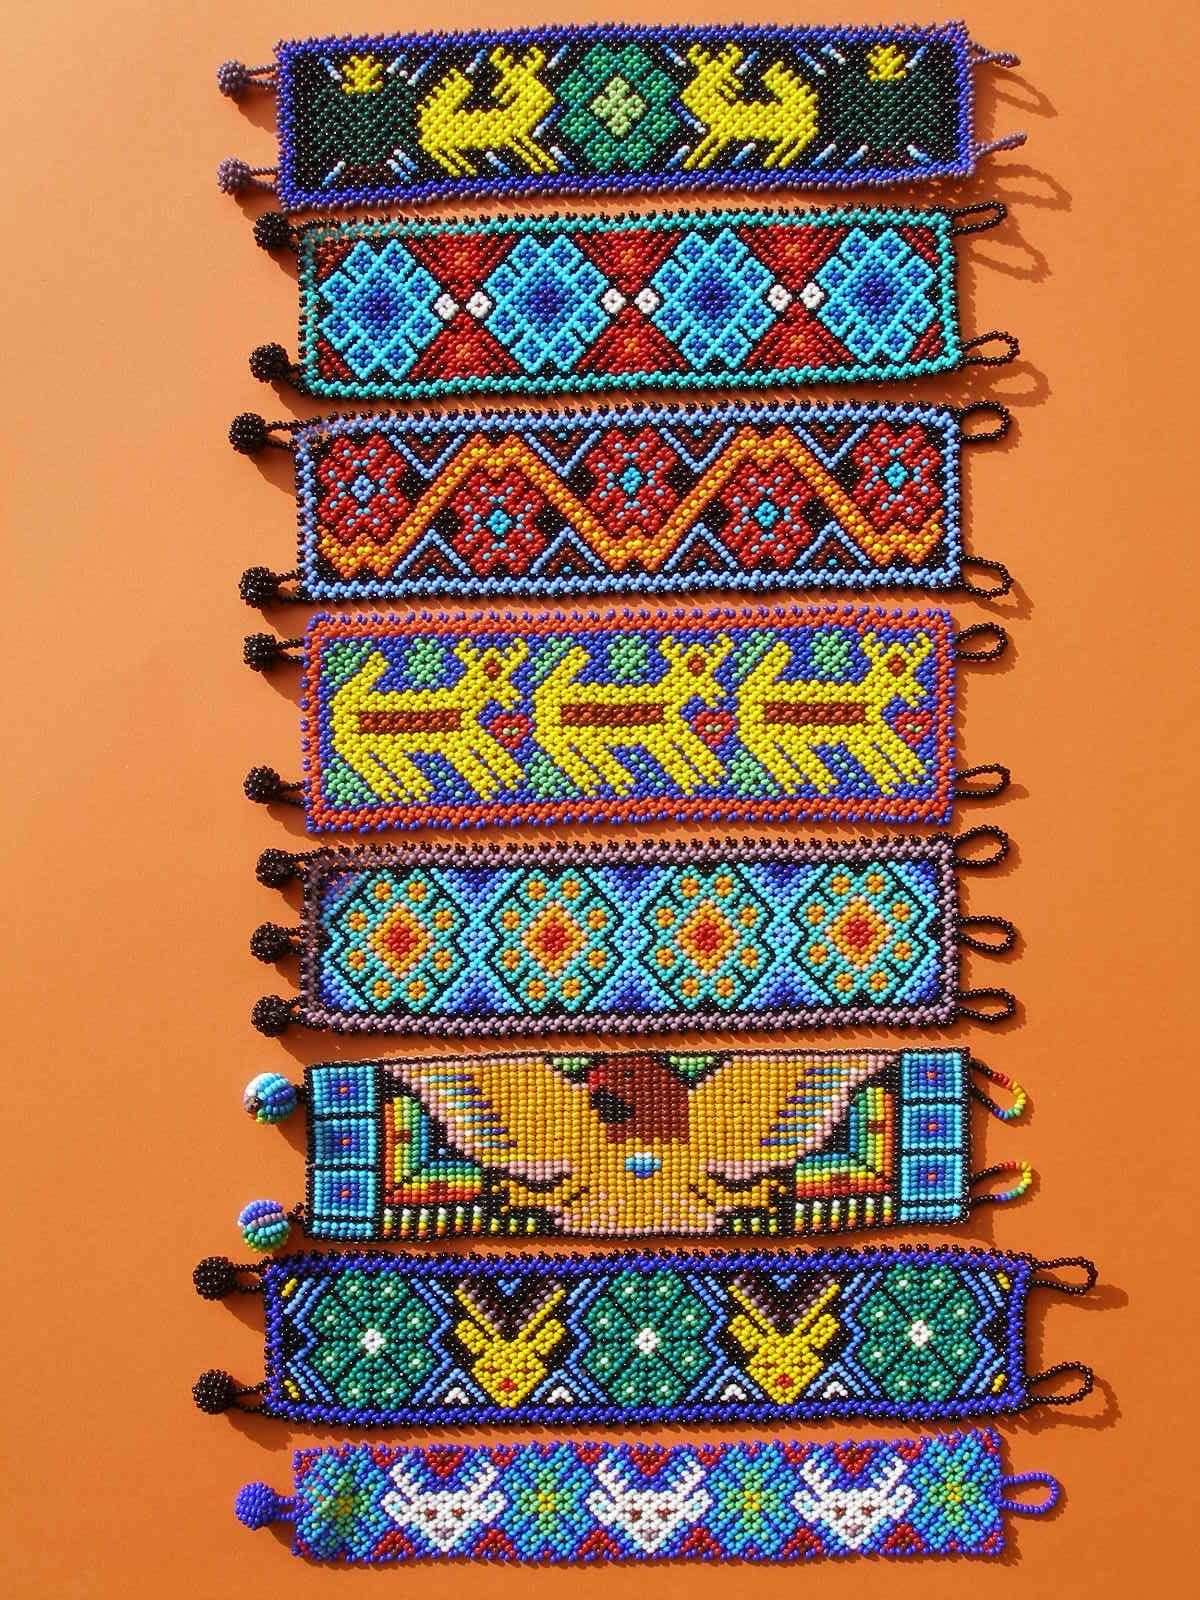 634ccd73a5cb Huichol Bracelets. Huichol Bracelets Artesanias Mexico ...